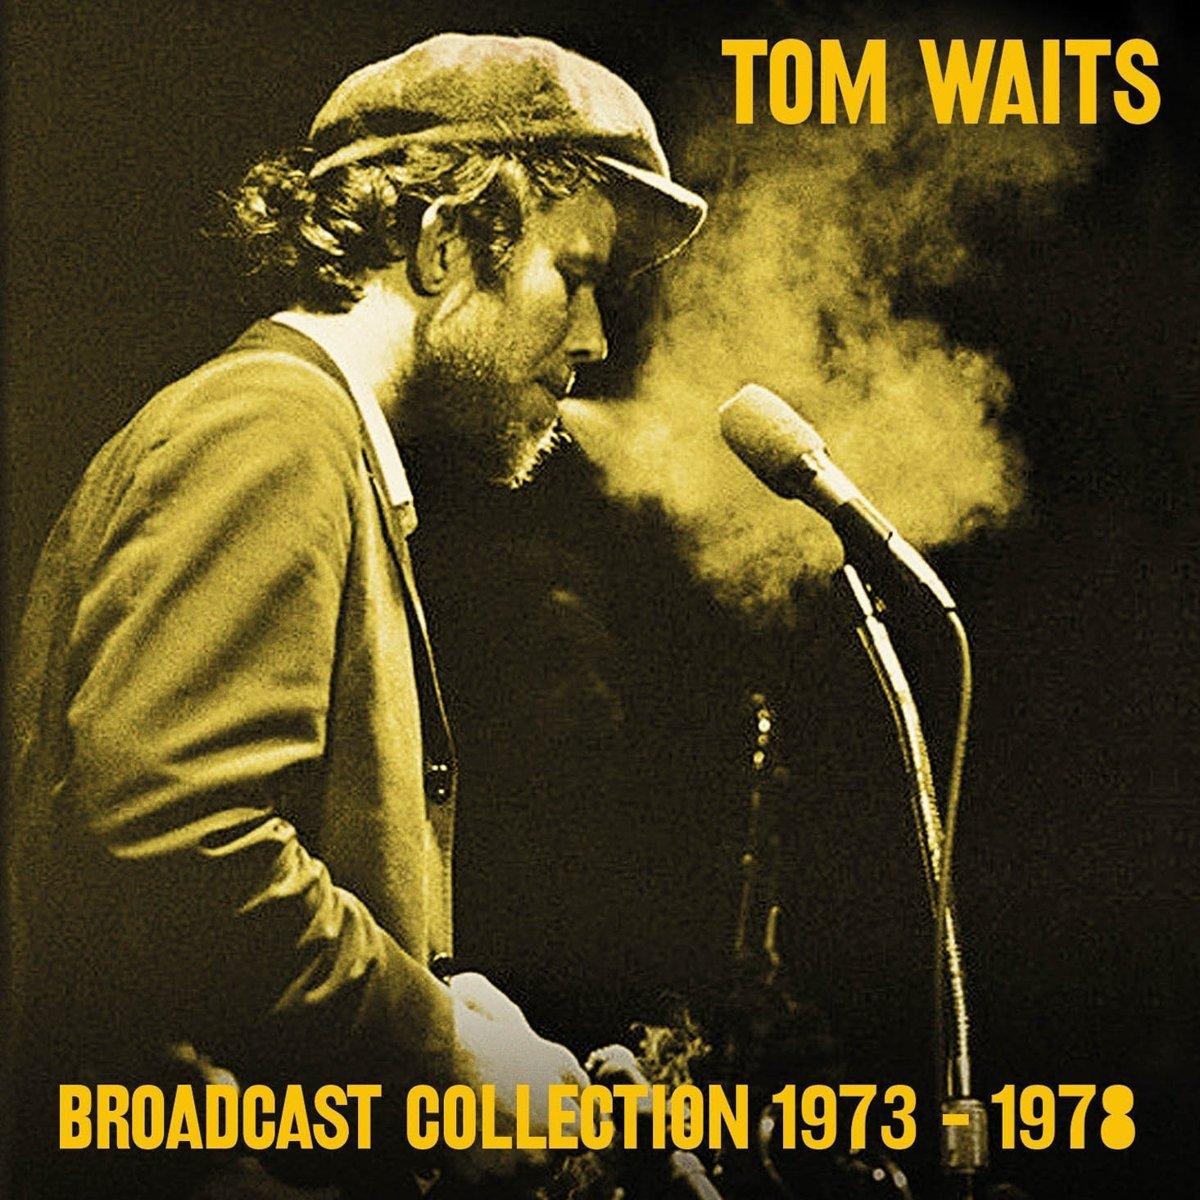 Tom Waits - Broadcast Collection 1973 - 1978 (7 CD SET)